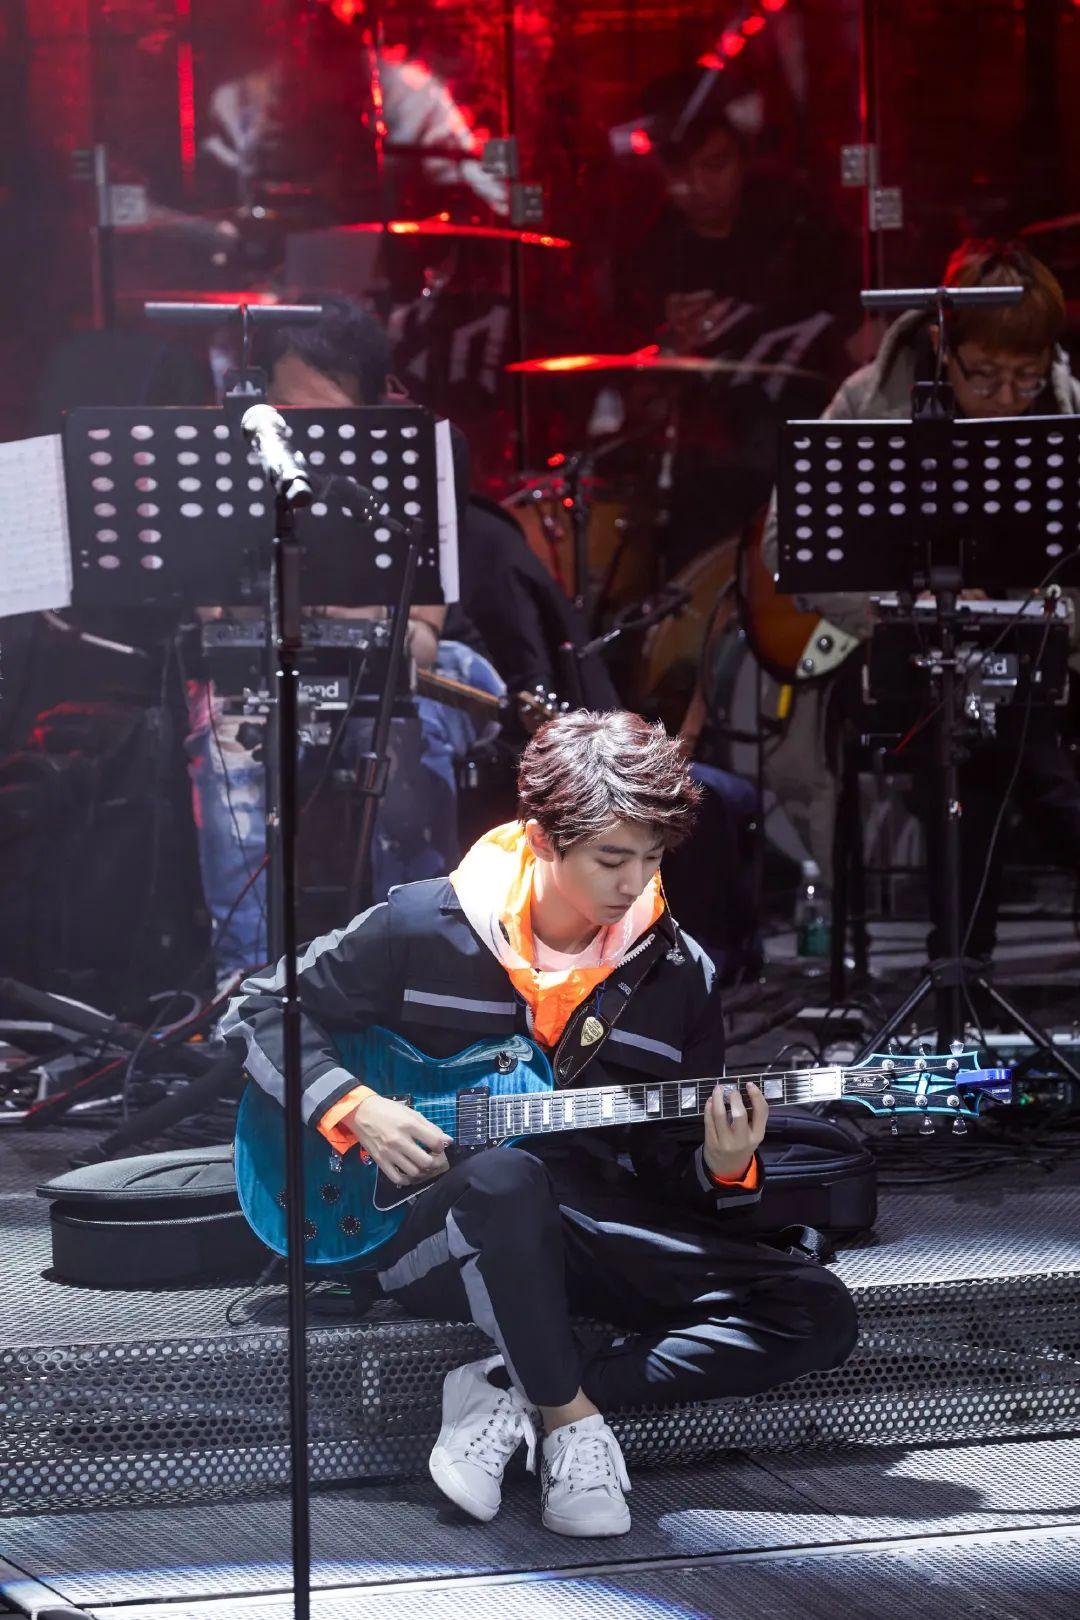 <b>《我们的乐队》剧透来袭,王俊凯现场演绎摇滚版《树读》,太酷!</b>